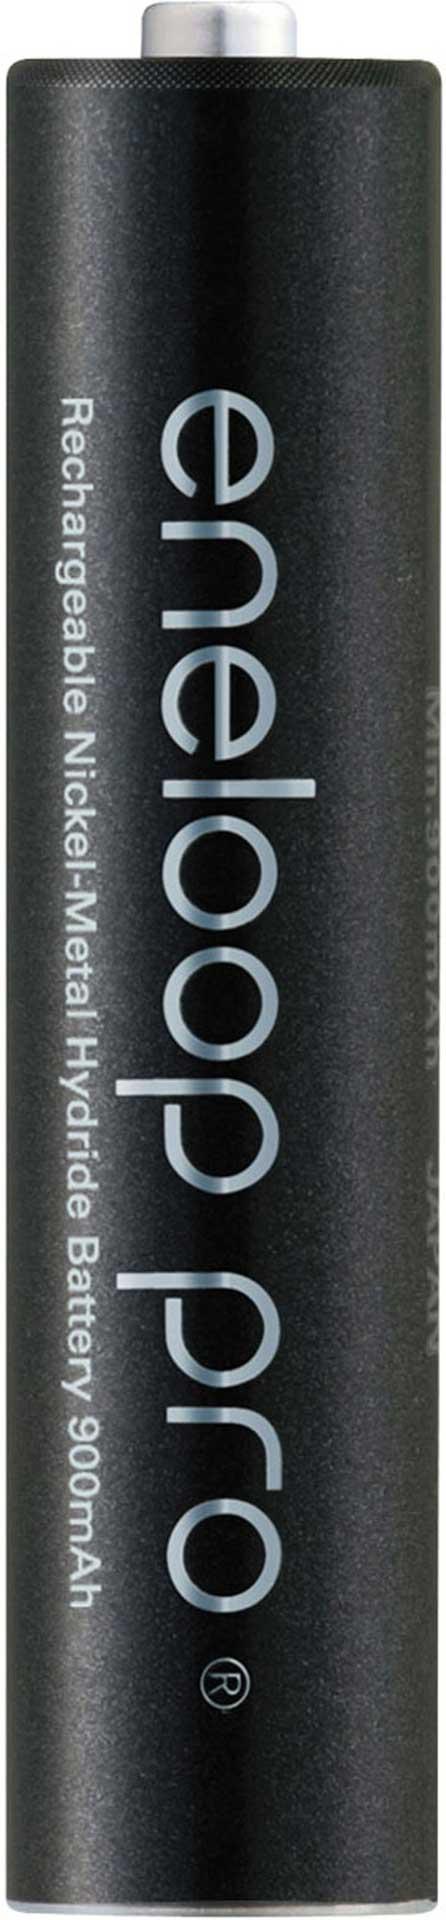 PANASONIC ENELOOP PRO MICRO AAA 900 MAH 1,2 VOLT